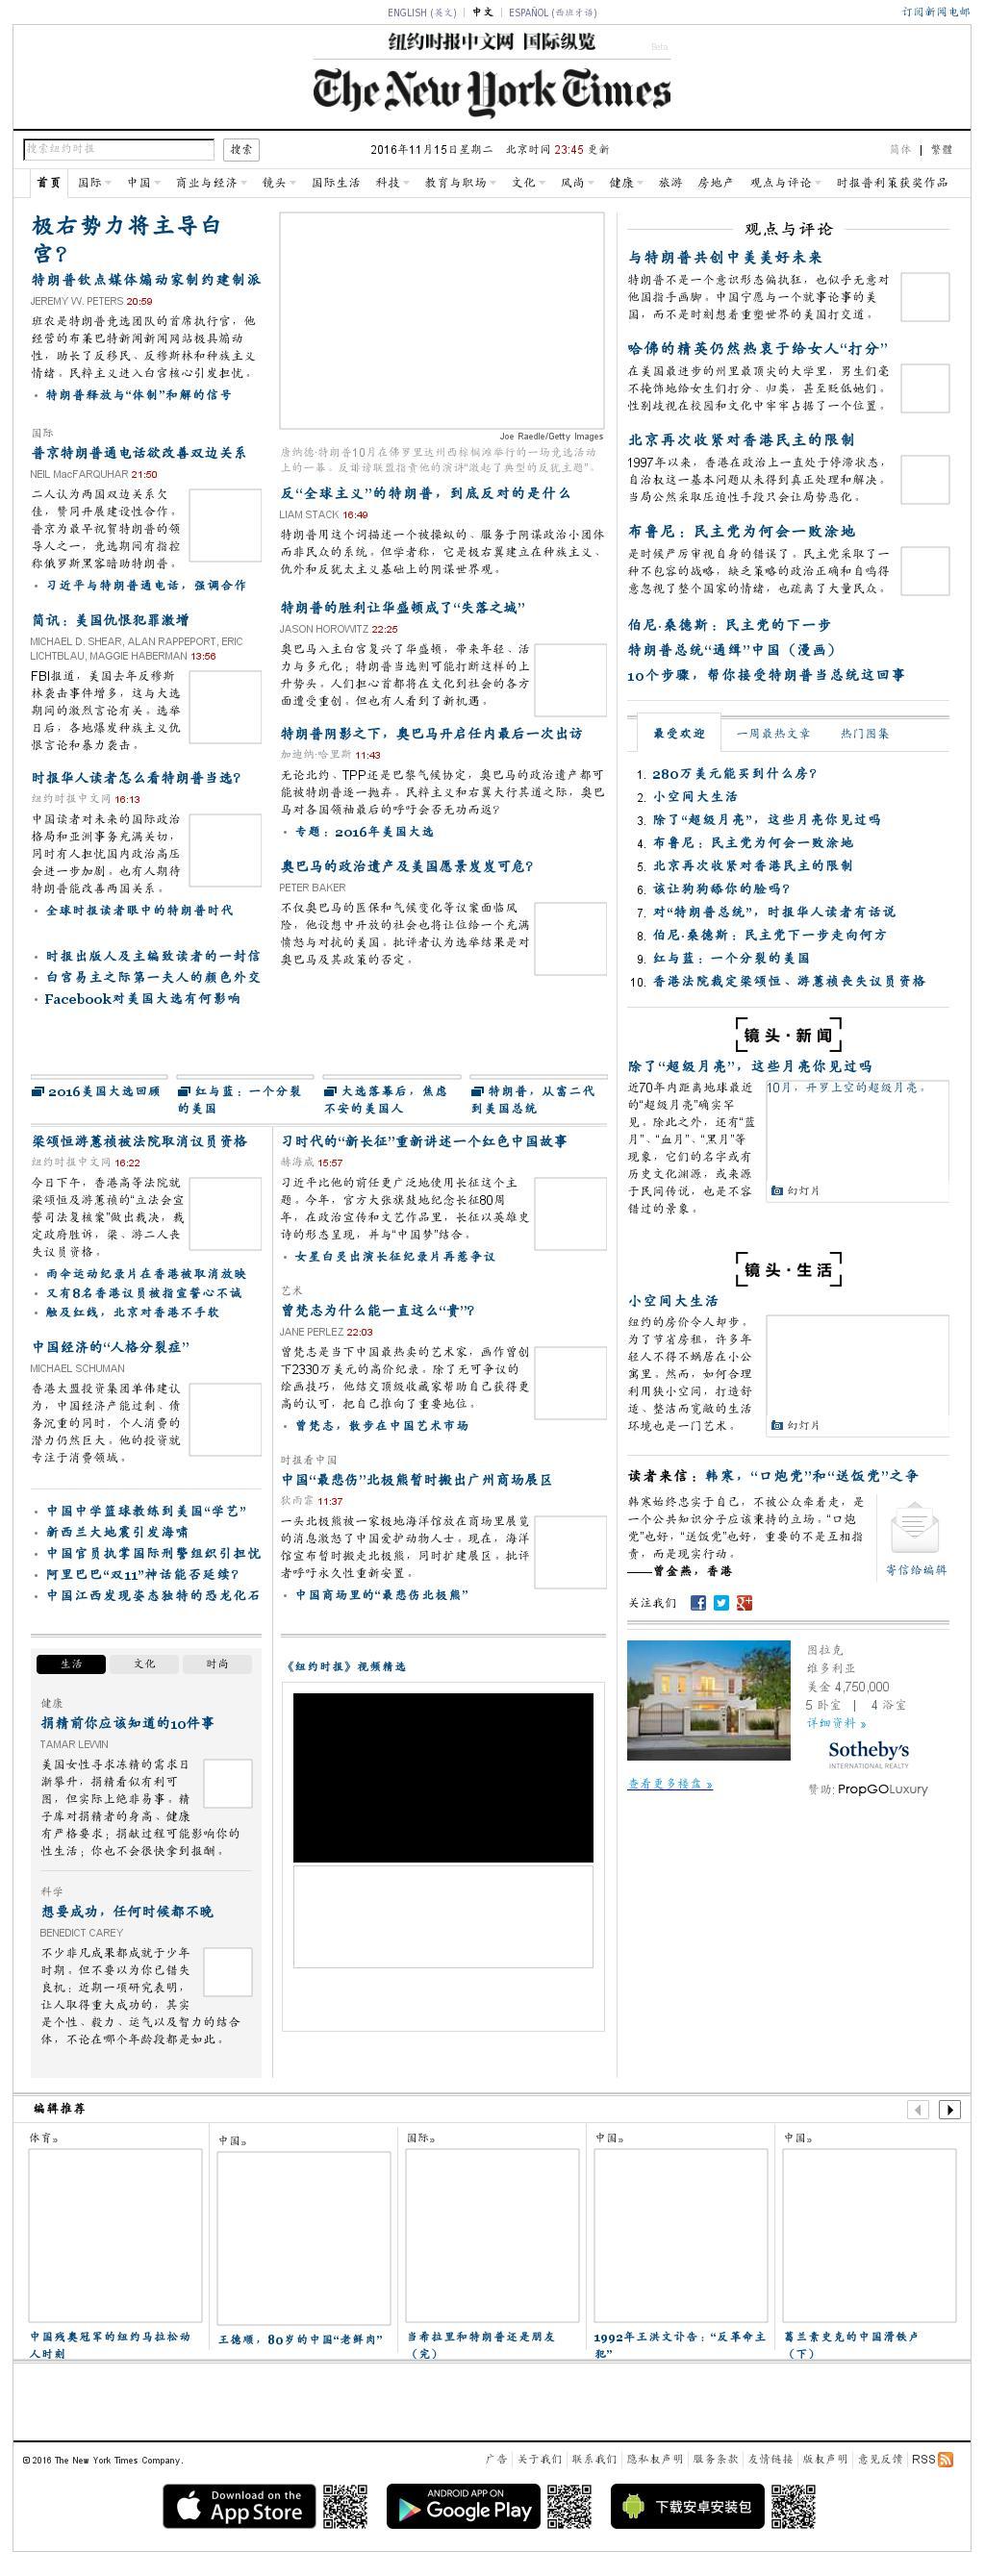 The New York Times (Chinese) at Tuesday Nov. 15, 2016, 8:12 p.m. UTC